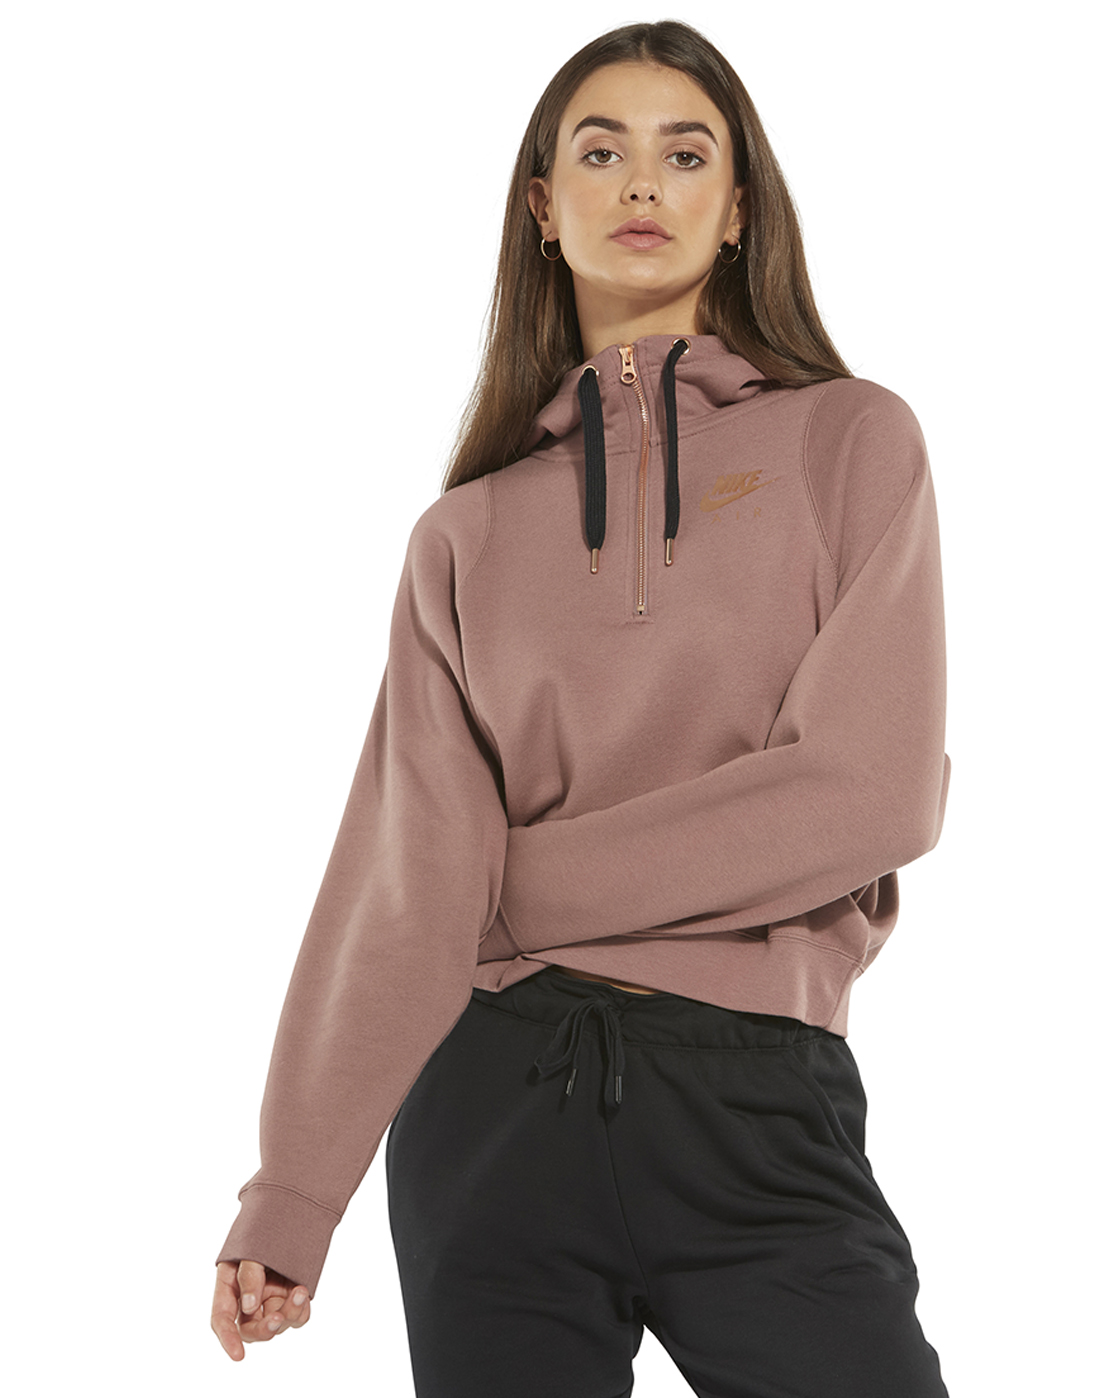 fb6abf76a57e Women s Metallic Nike Air Half Zip Hoodie